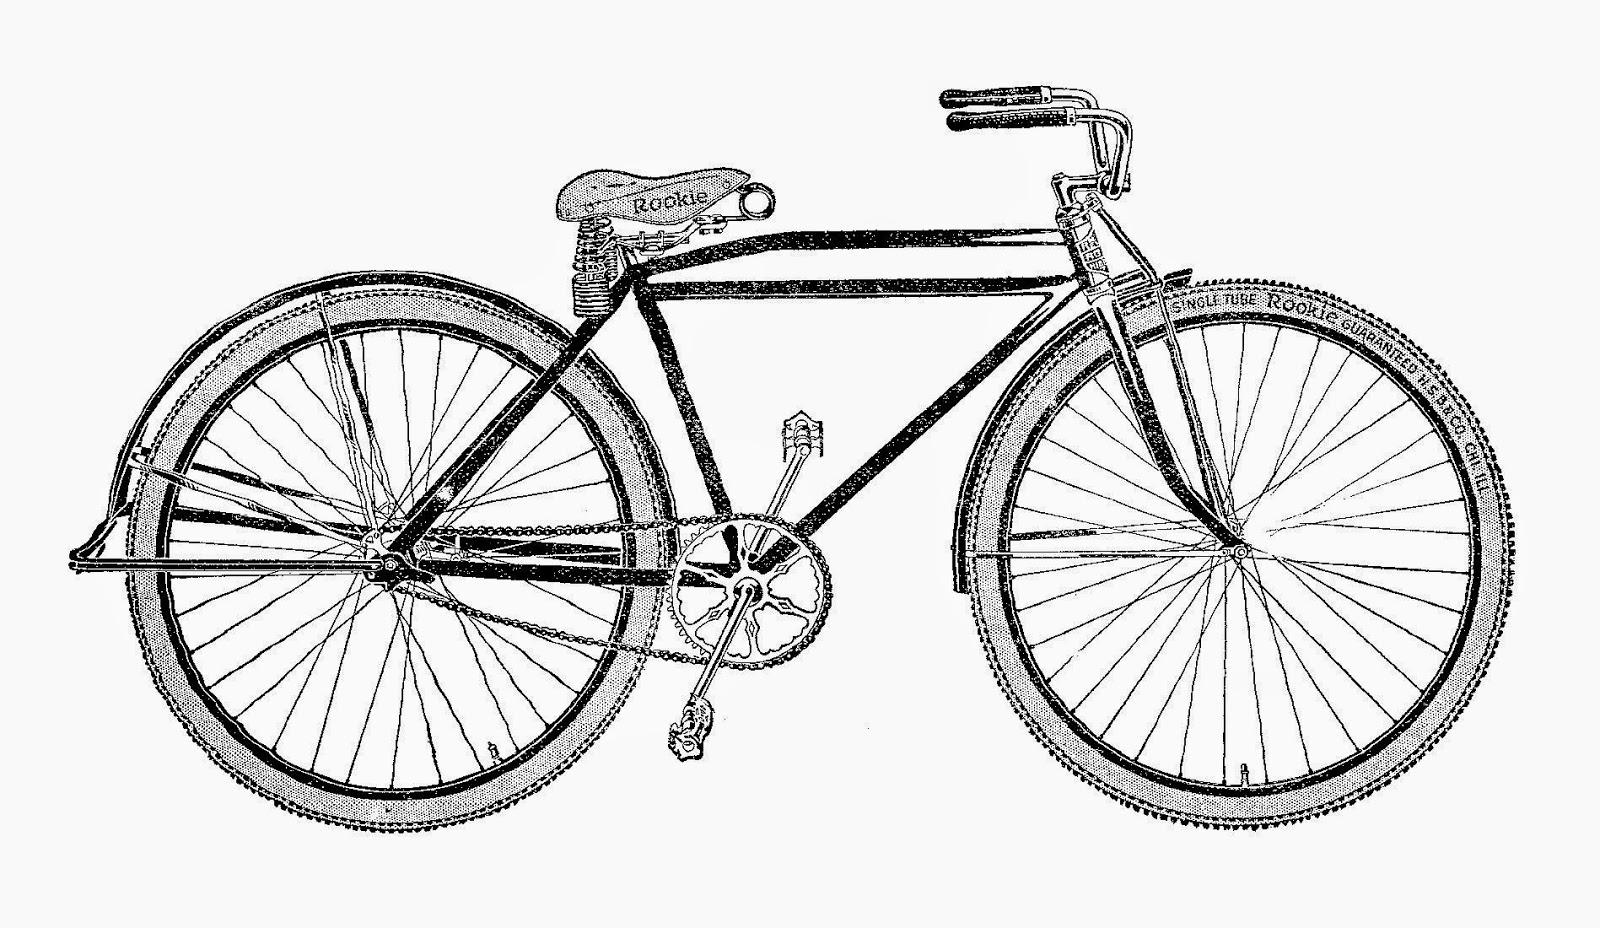 http://1.bp.blogspot.com/-f9XYFWzCbwE/VOfYVcMvR5I/AAAAAAAAVh4/jSnD6rfFrQ4/s1600/rookie_bike_1919_105.jpg